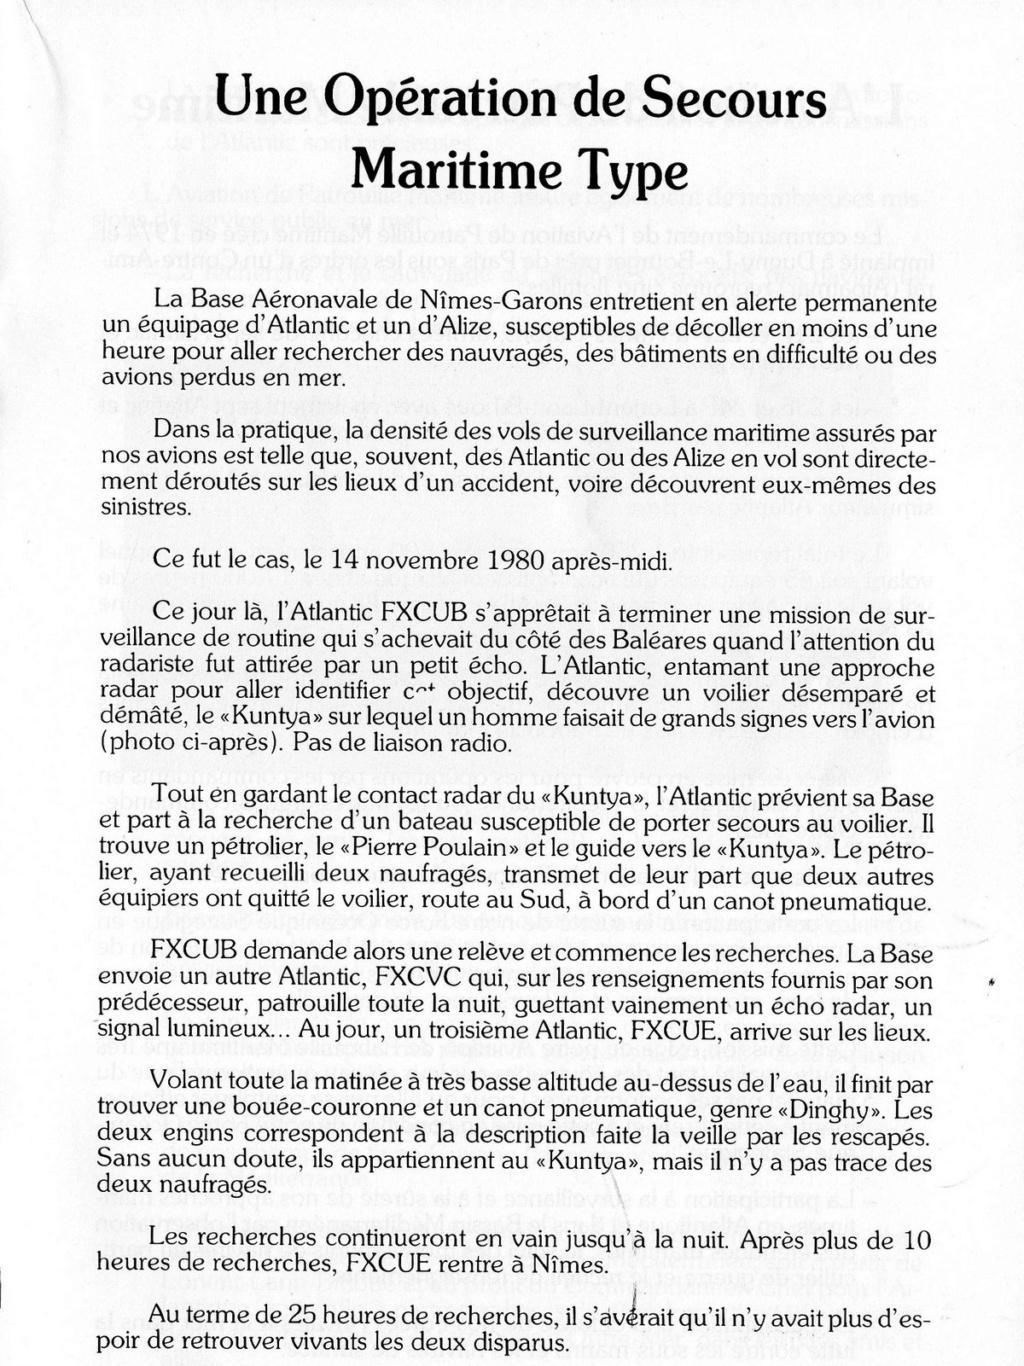 [LES B.A.N.] NÎMES GARONS - Page 4 Img67311